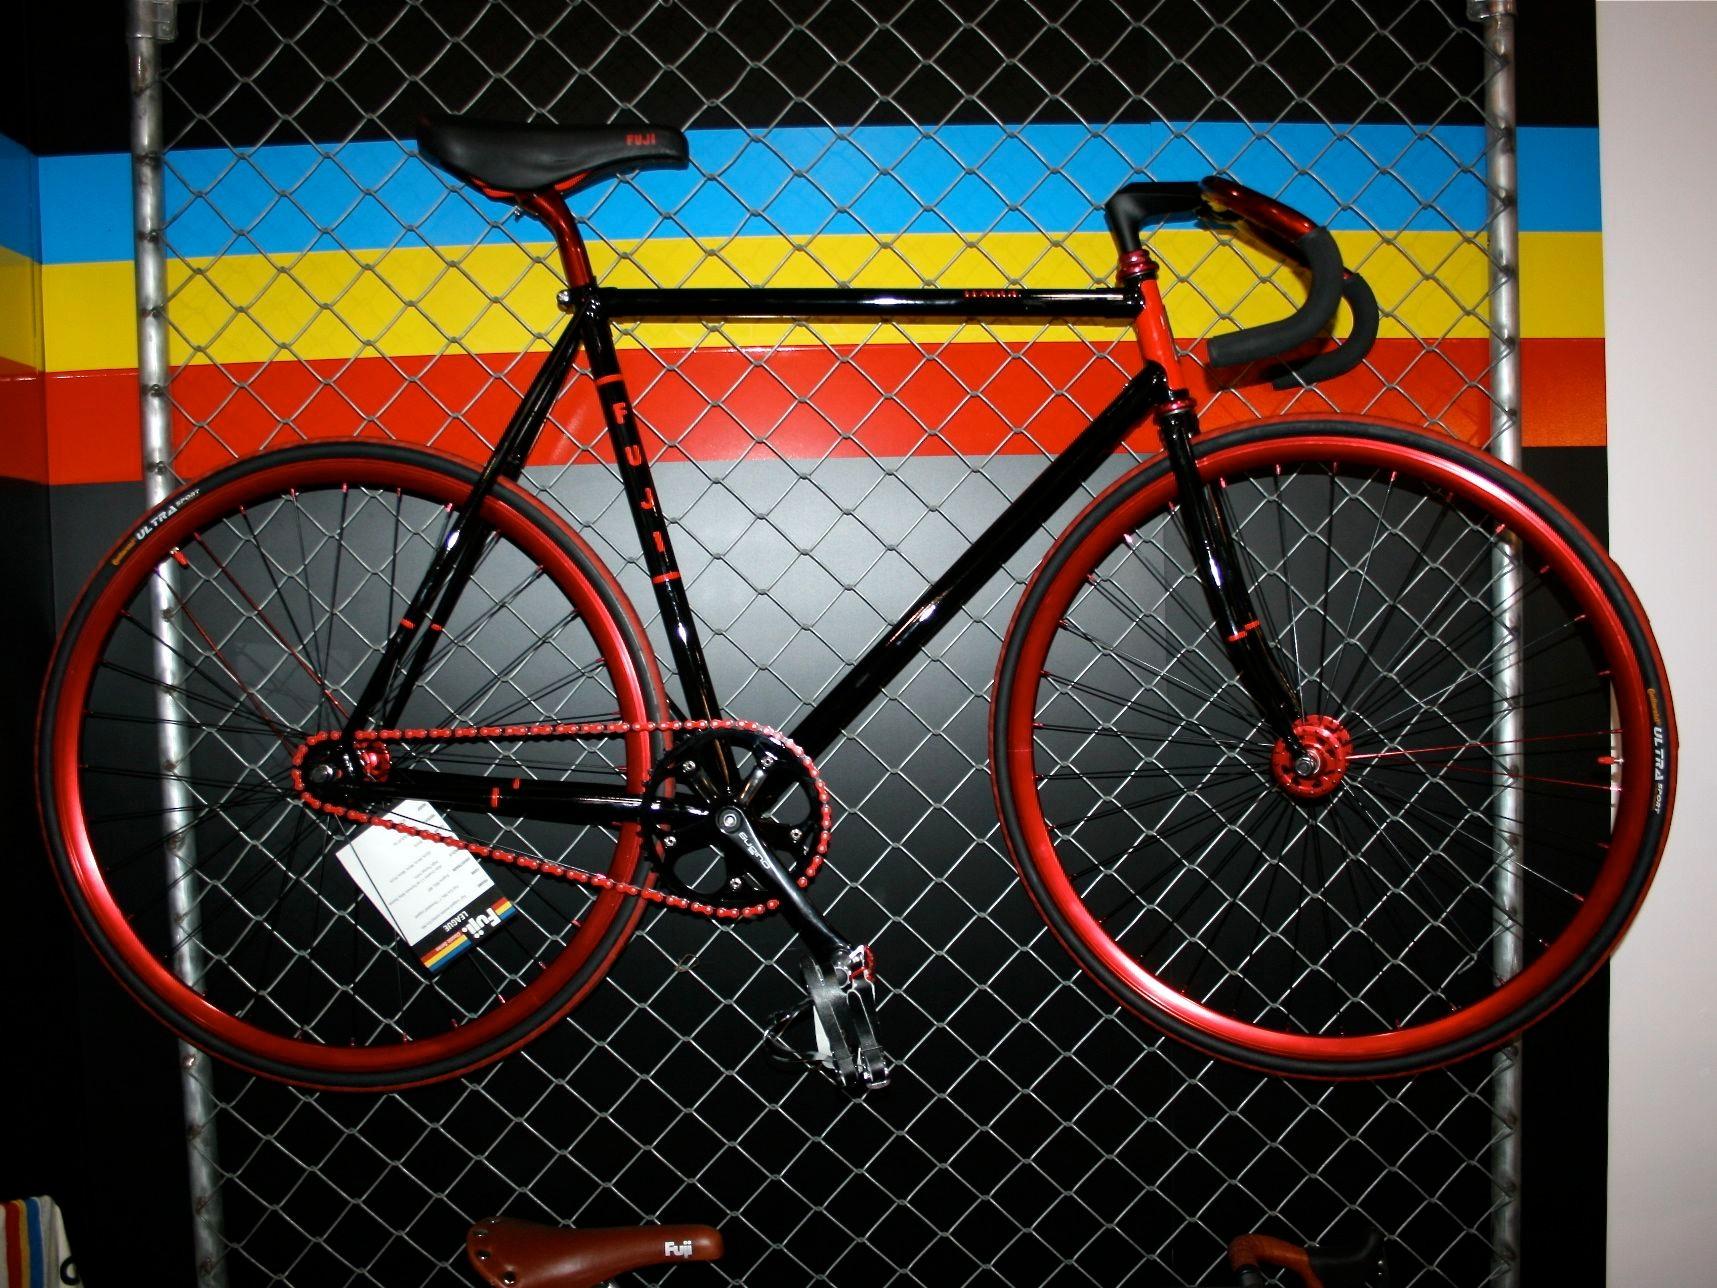 The Fuji League fixie...Satan's ride, perhaps?